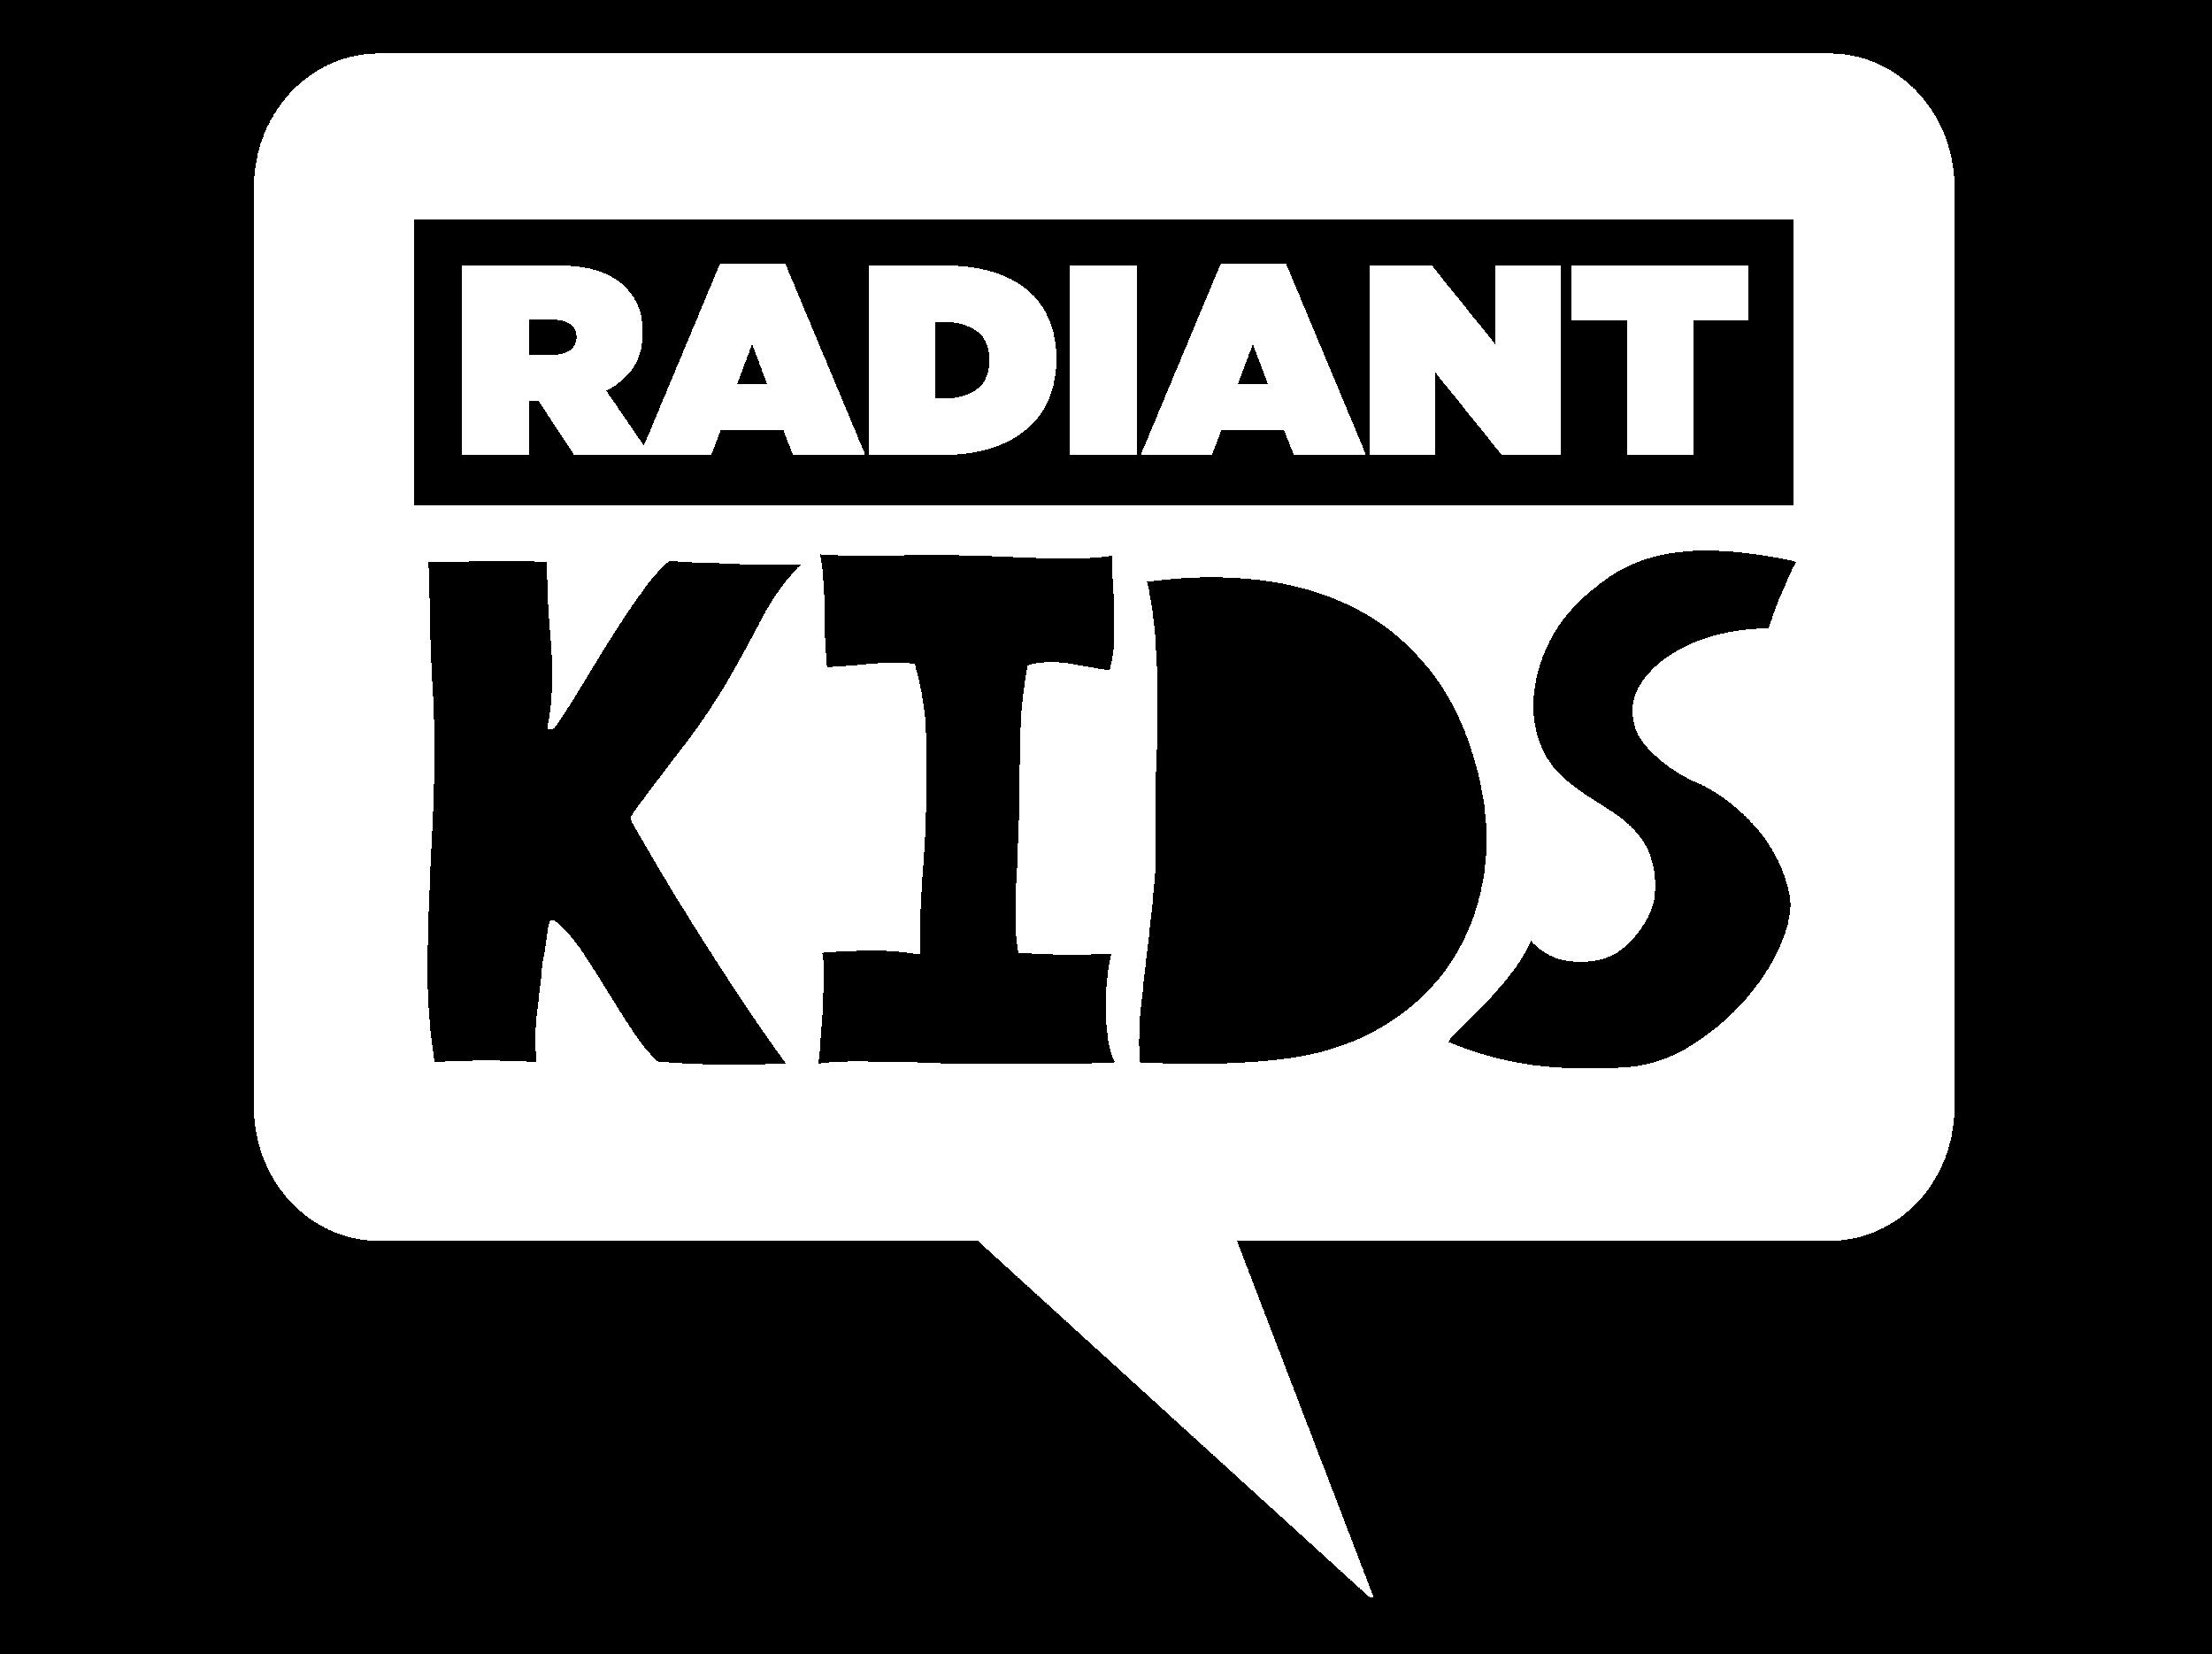 radkweb.png